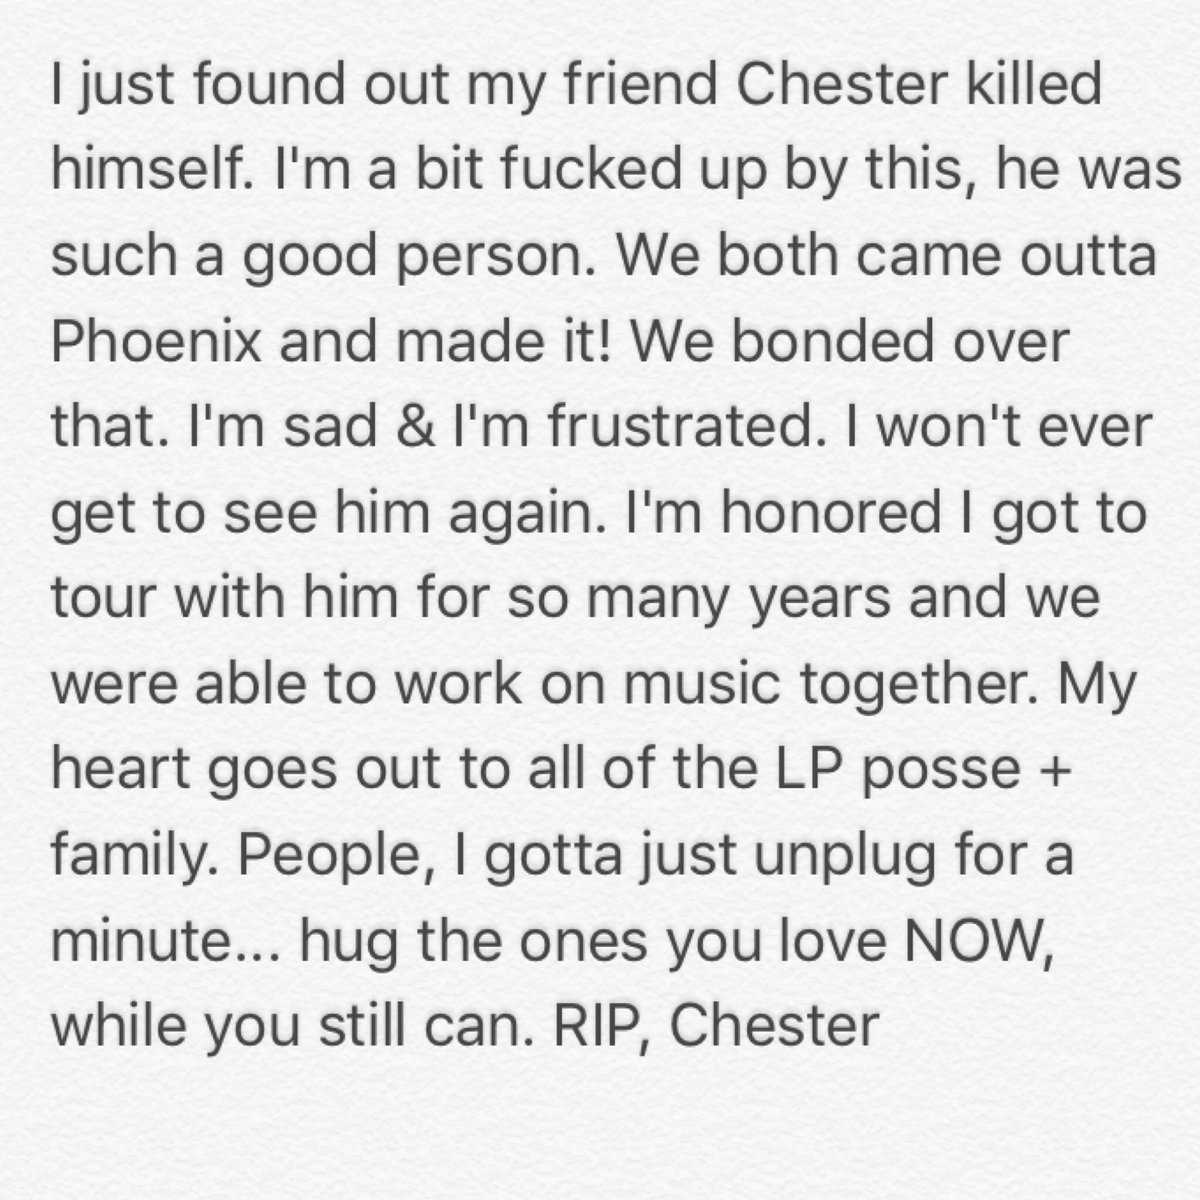 #RIP #ChesterBennington #LinkinPark https://t.co/83UJdadgVs